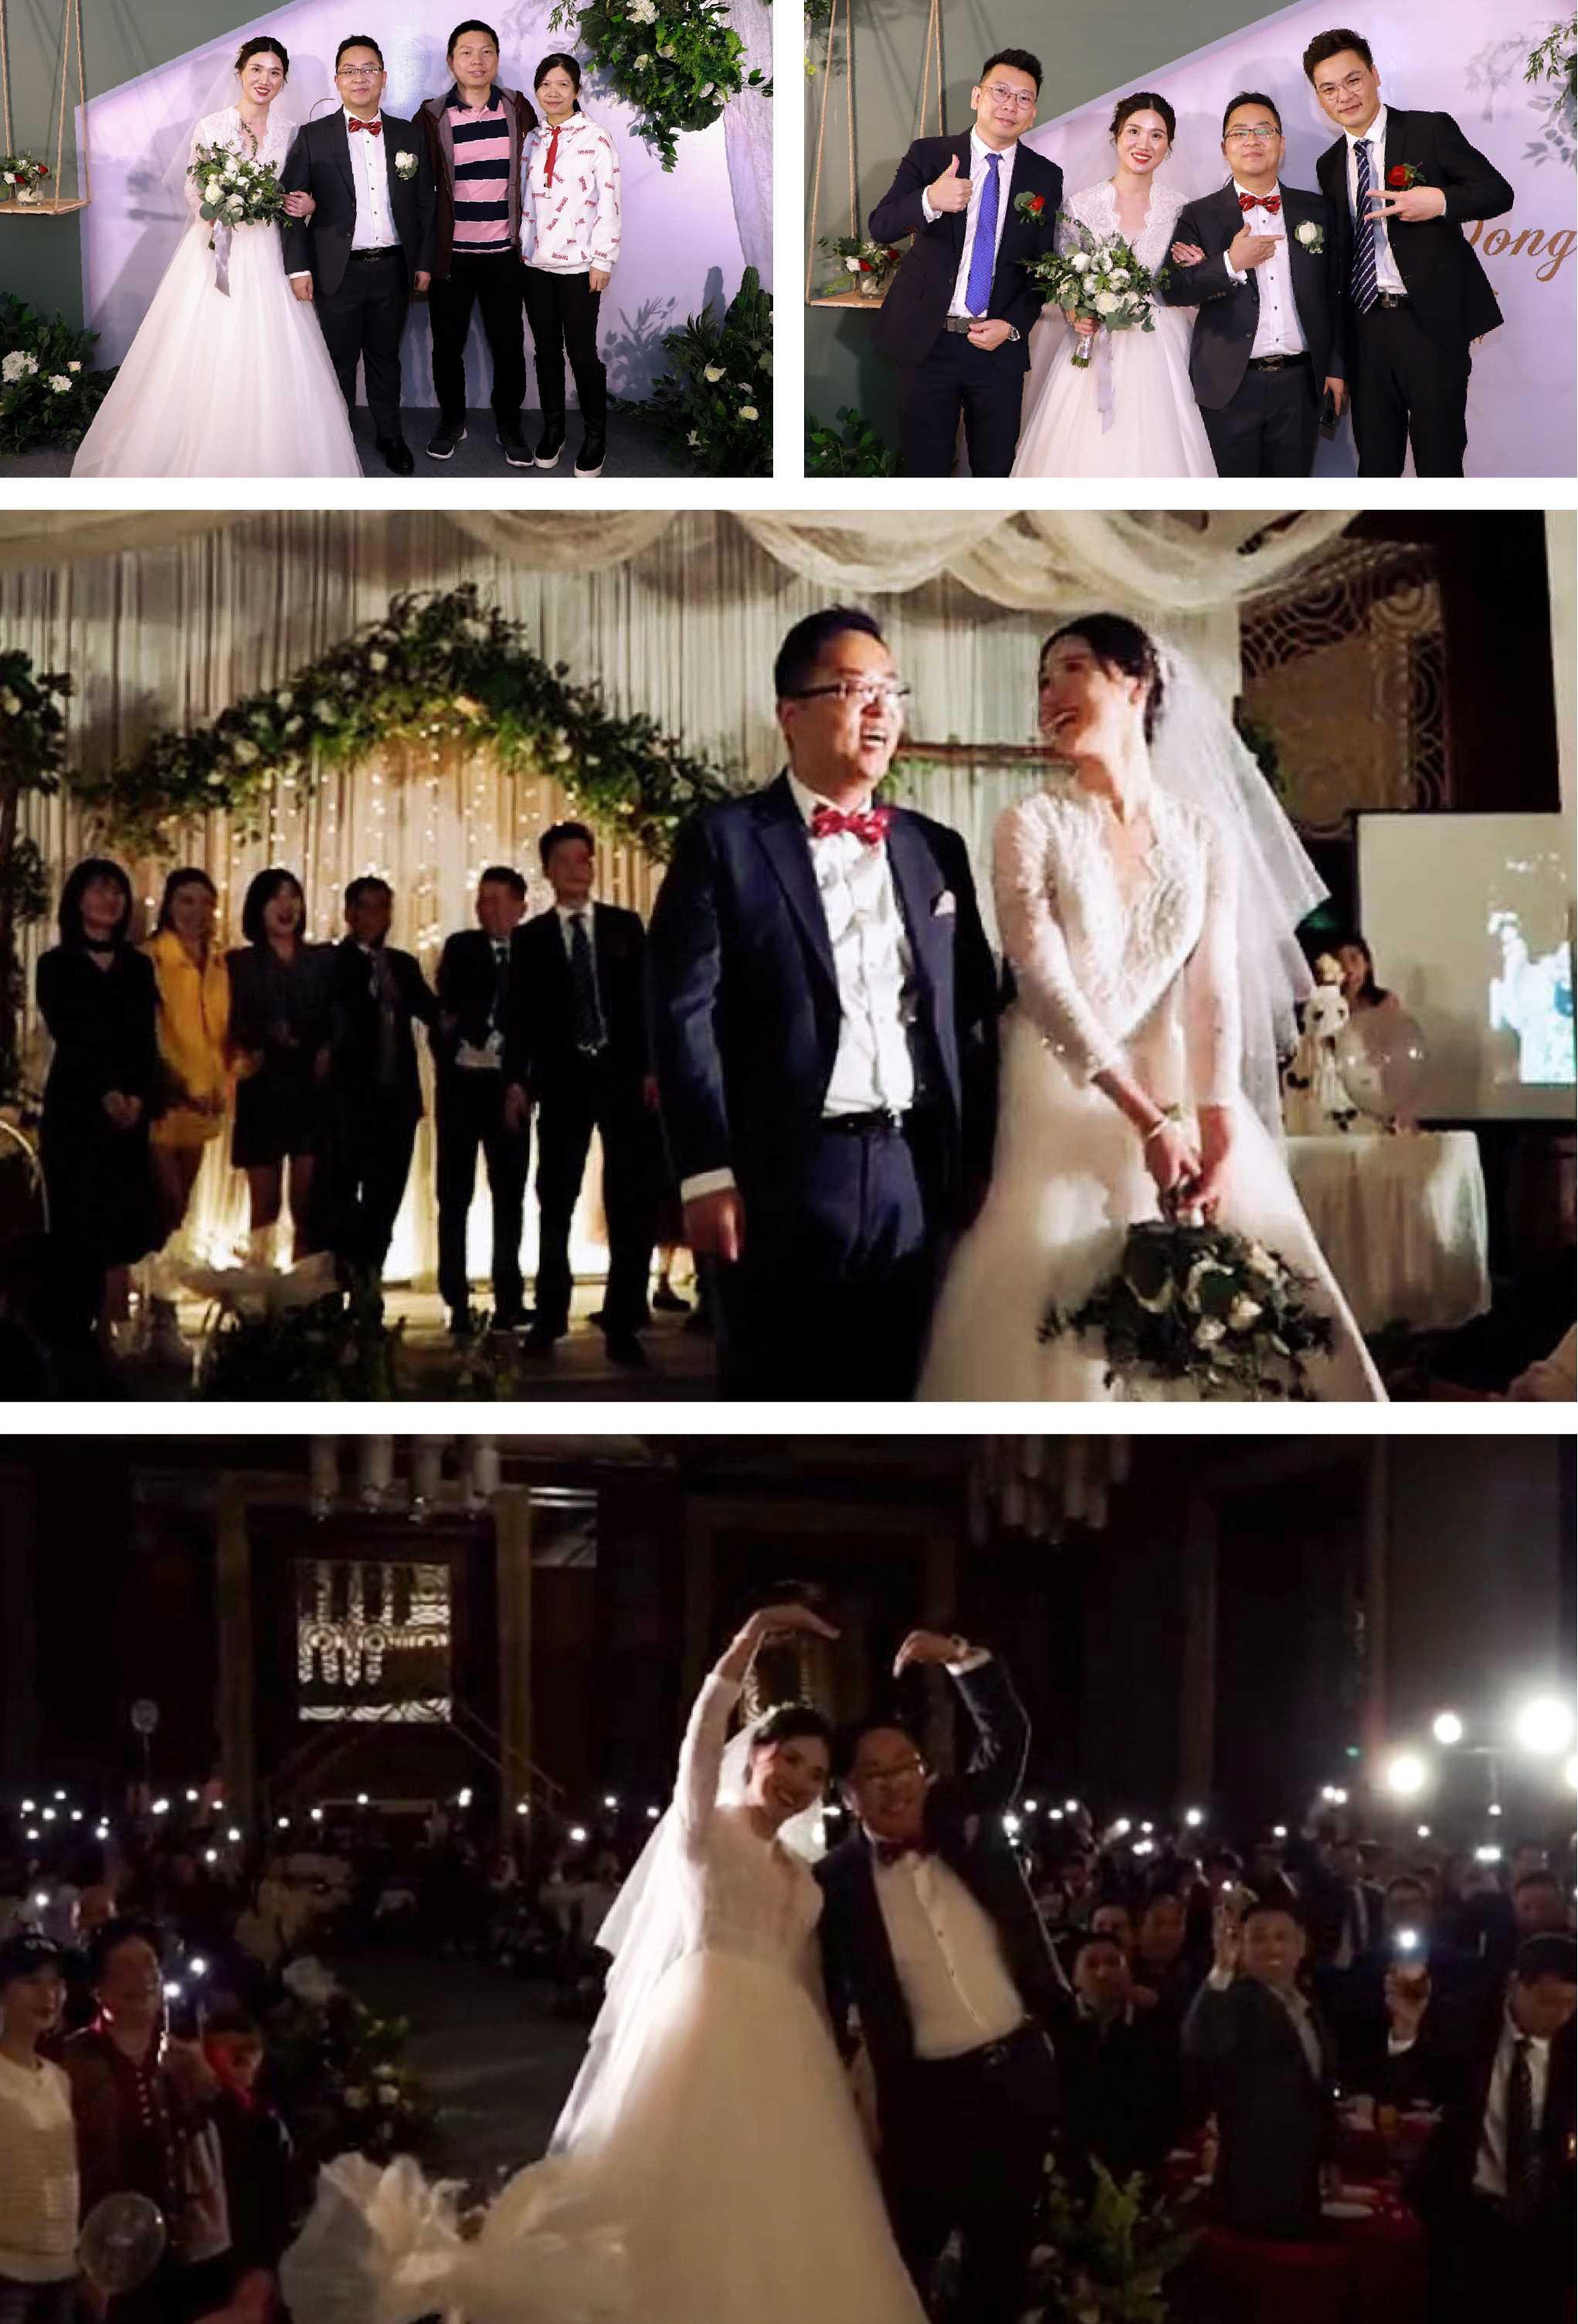 images-第5期-婚礼_画板-1-副本_03